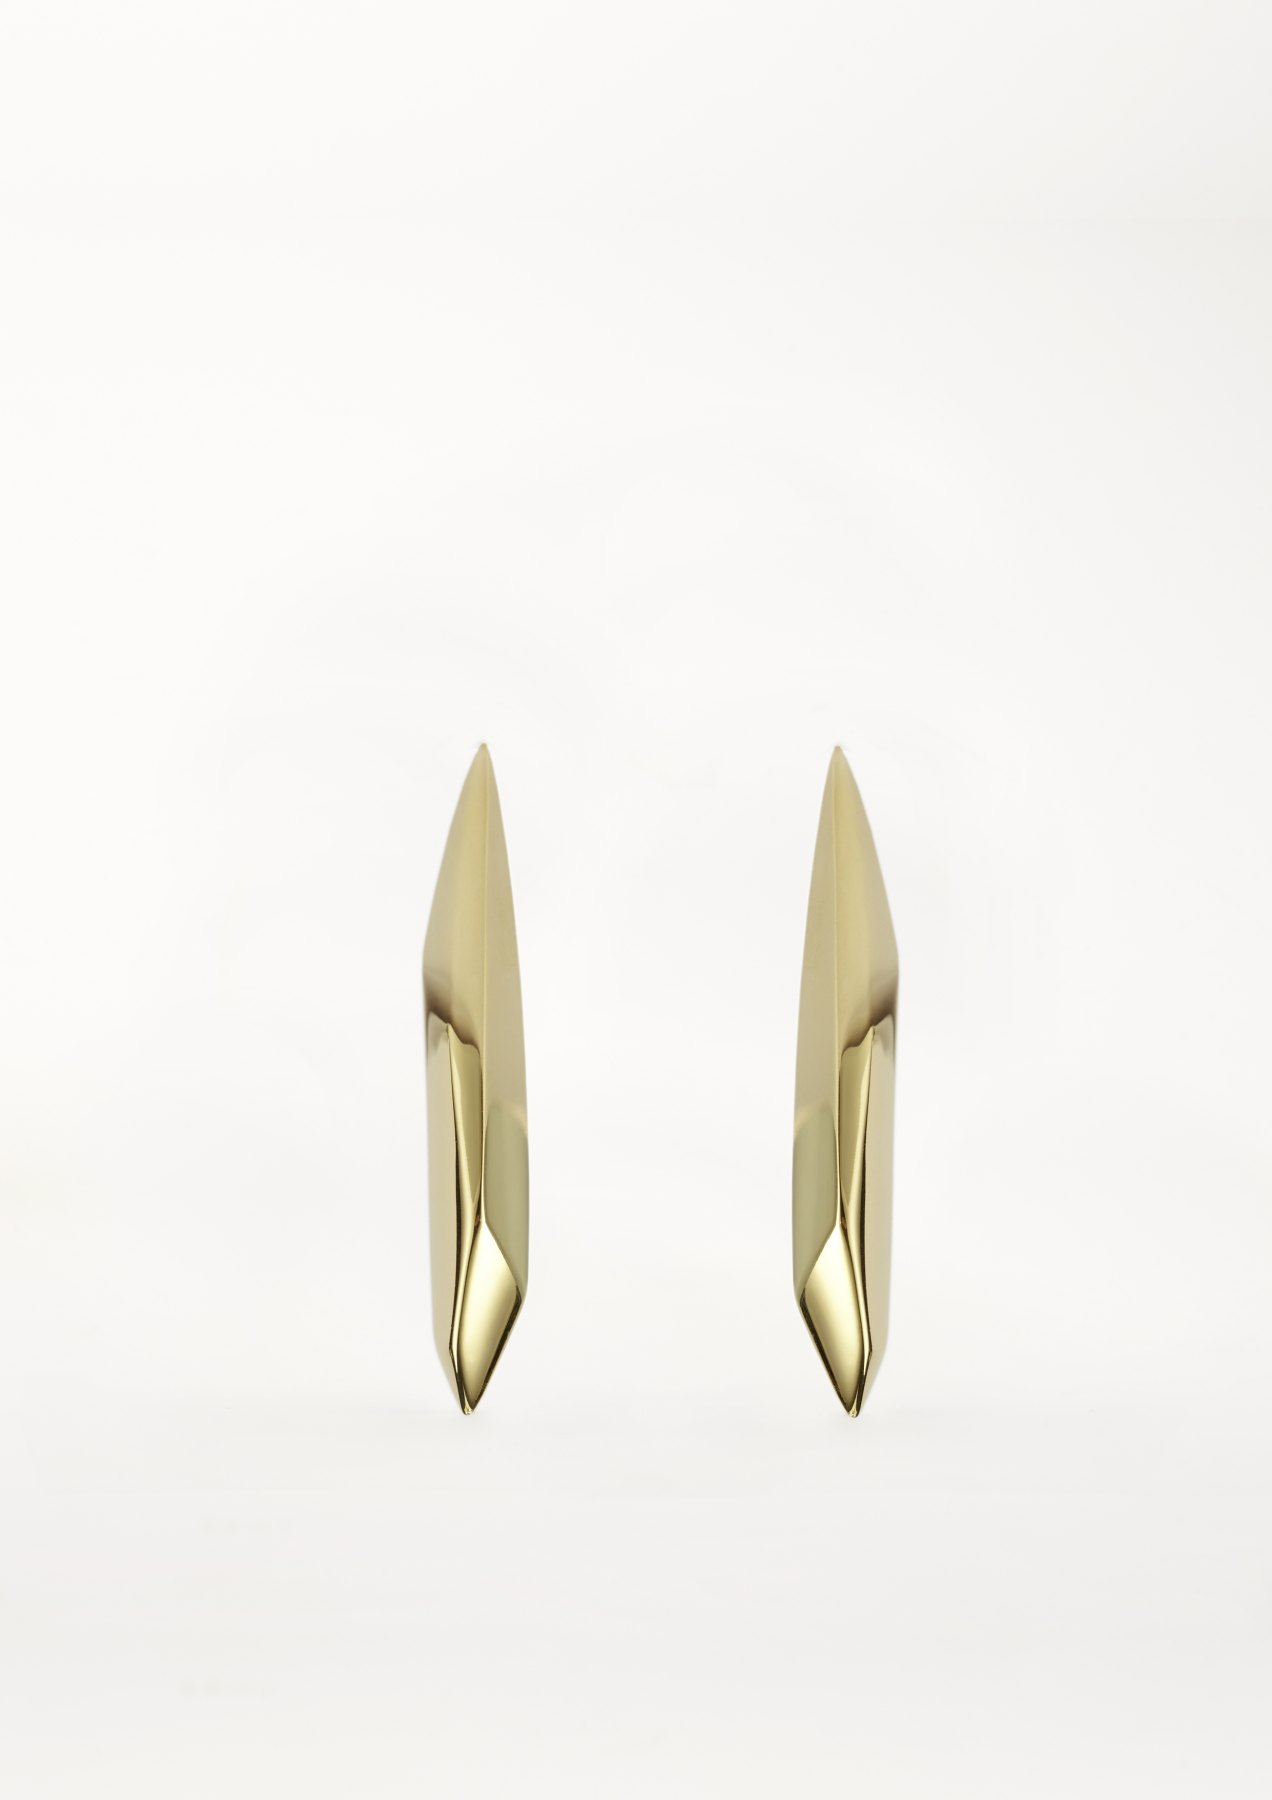 xenia bous jewellery Golden Stone 42 Long Diamond Earring gold silver